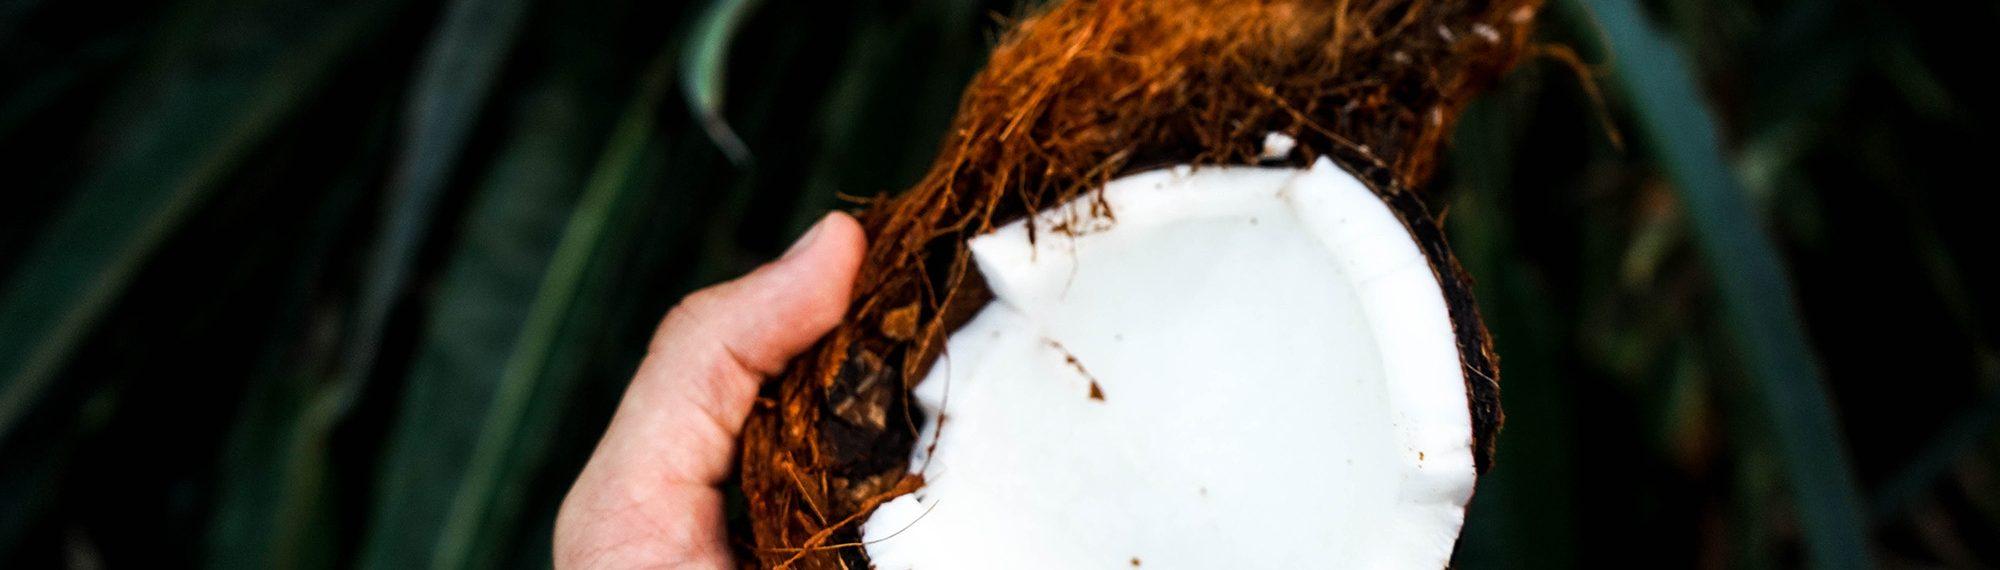 Coconut Oil Alison Wells